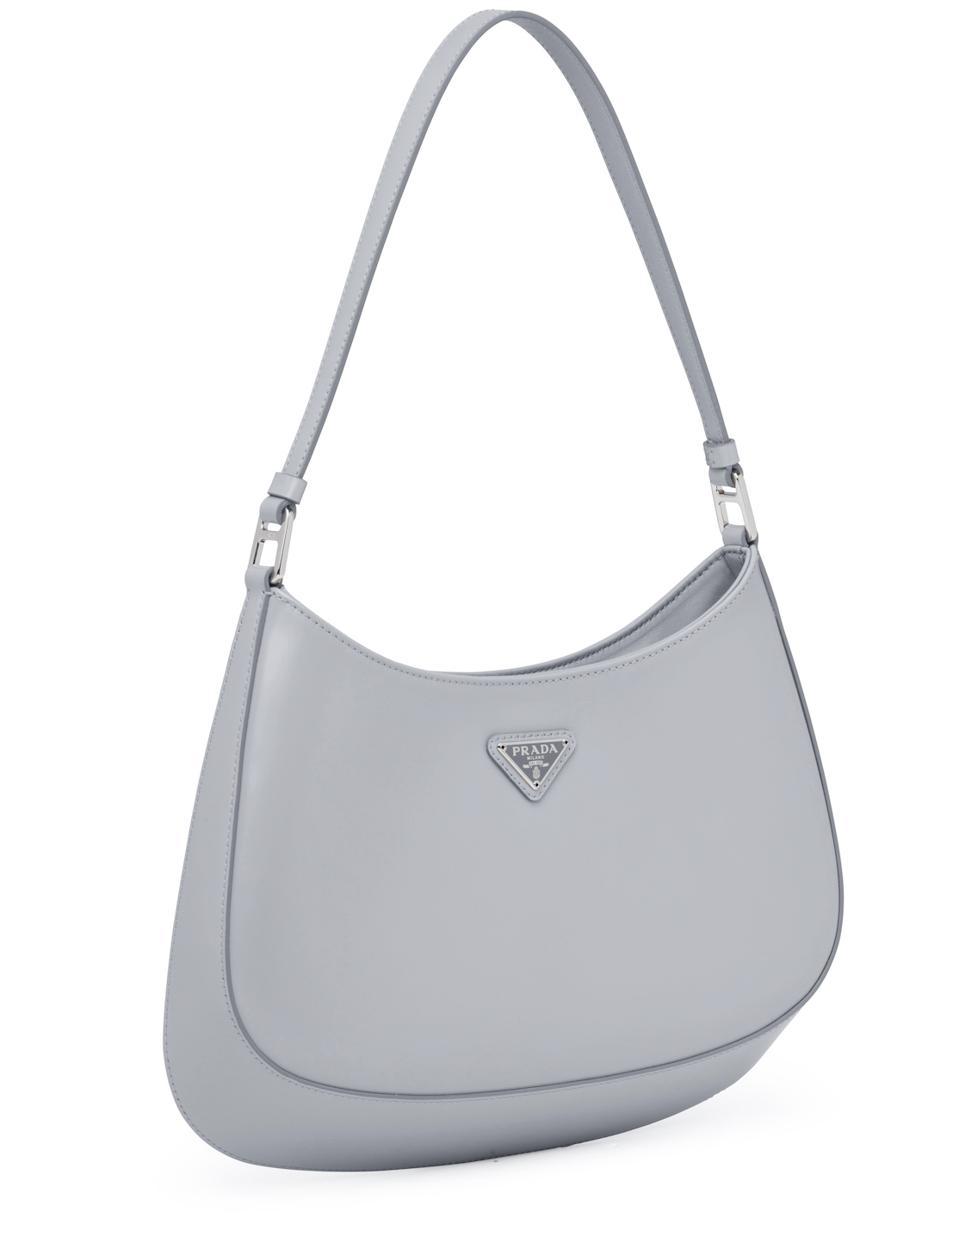 Available at select Prada boutiques, www.Prada.com